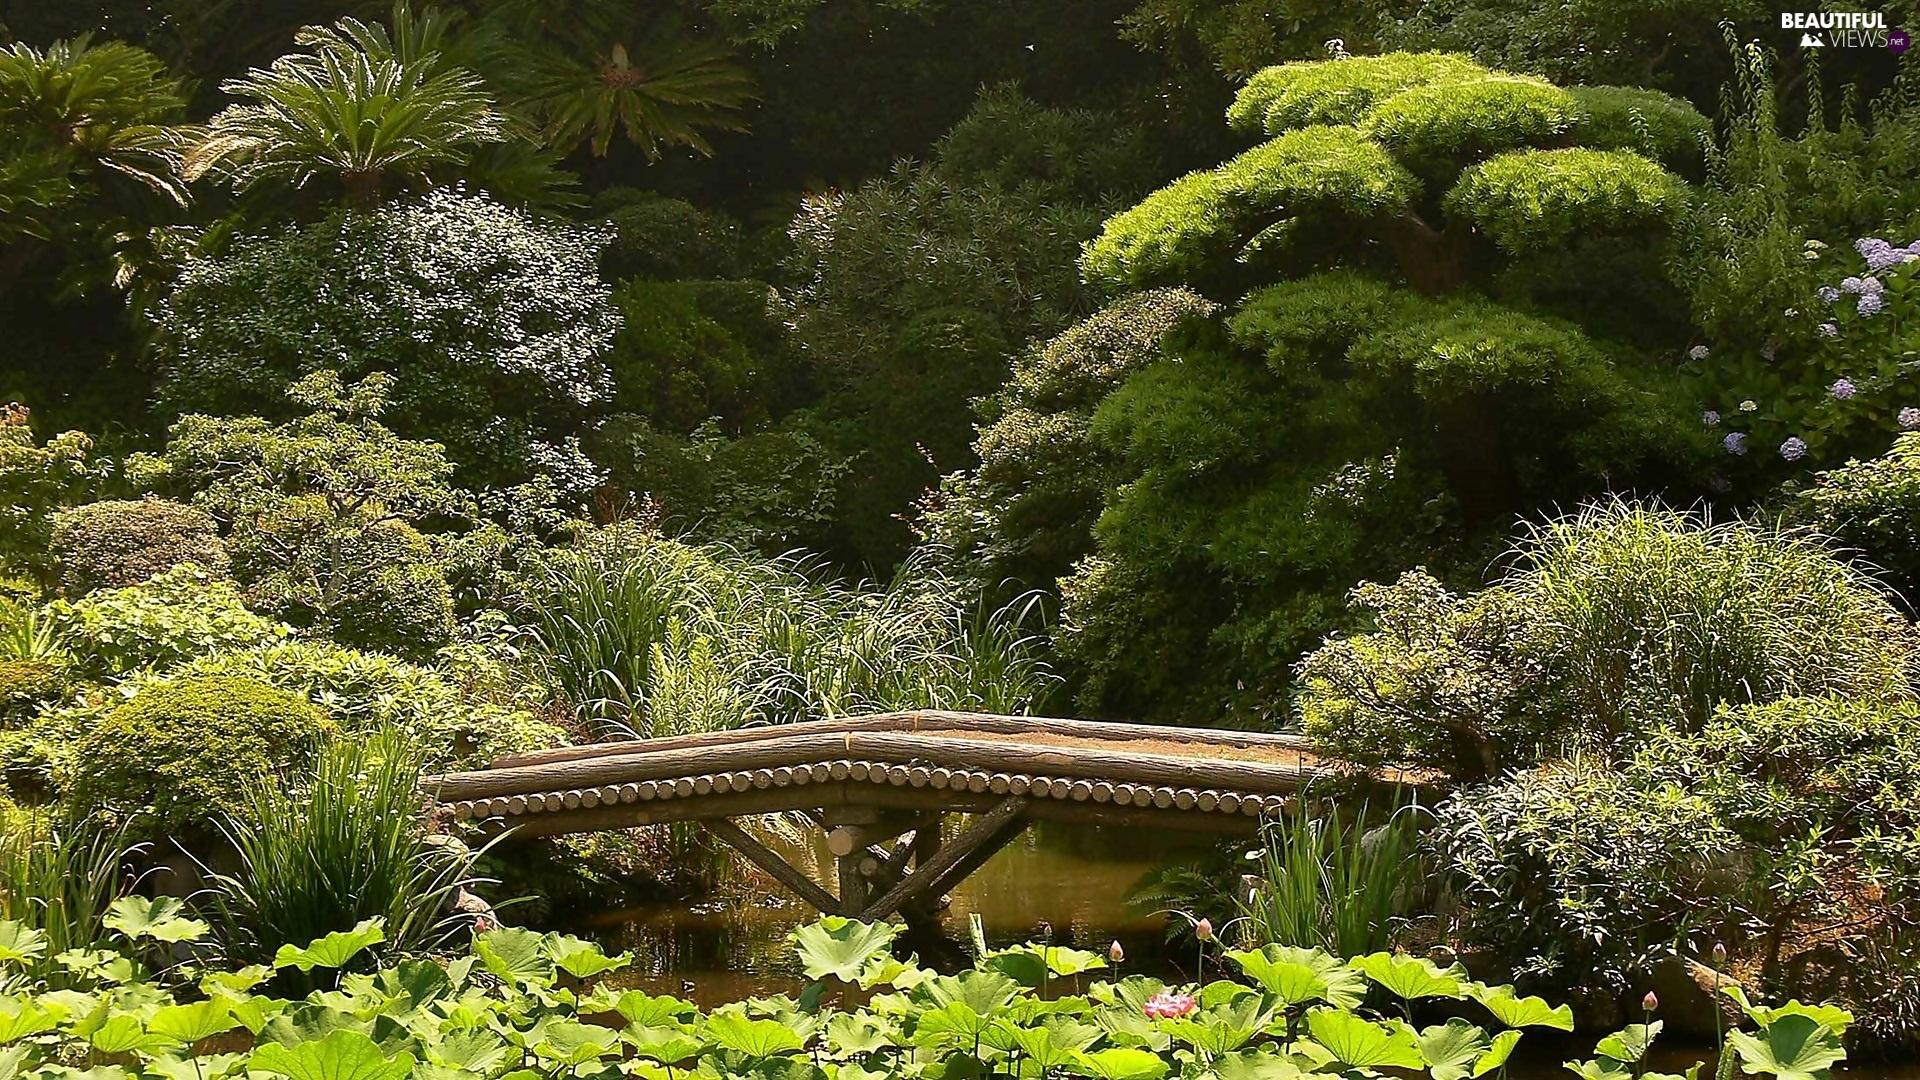 Wooden Pond Car Garden Bridges Japanese Beautiful